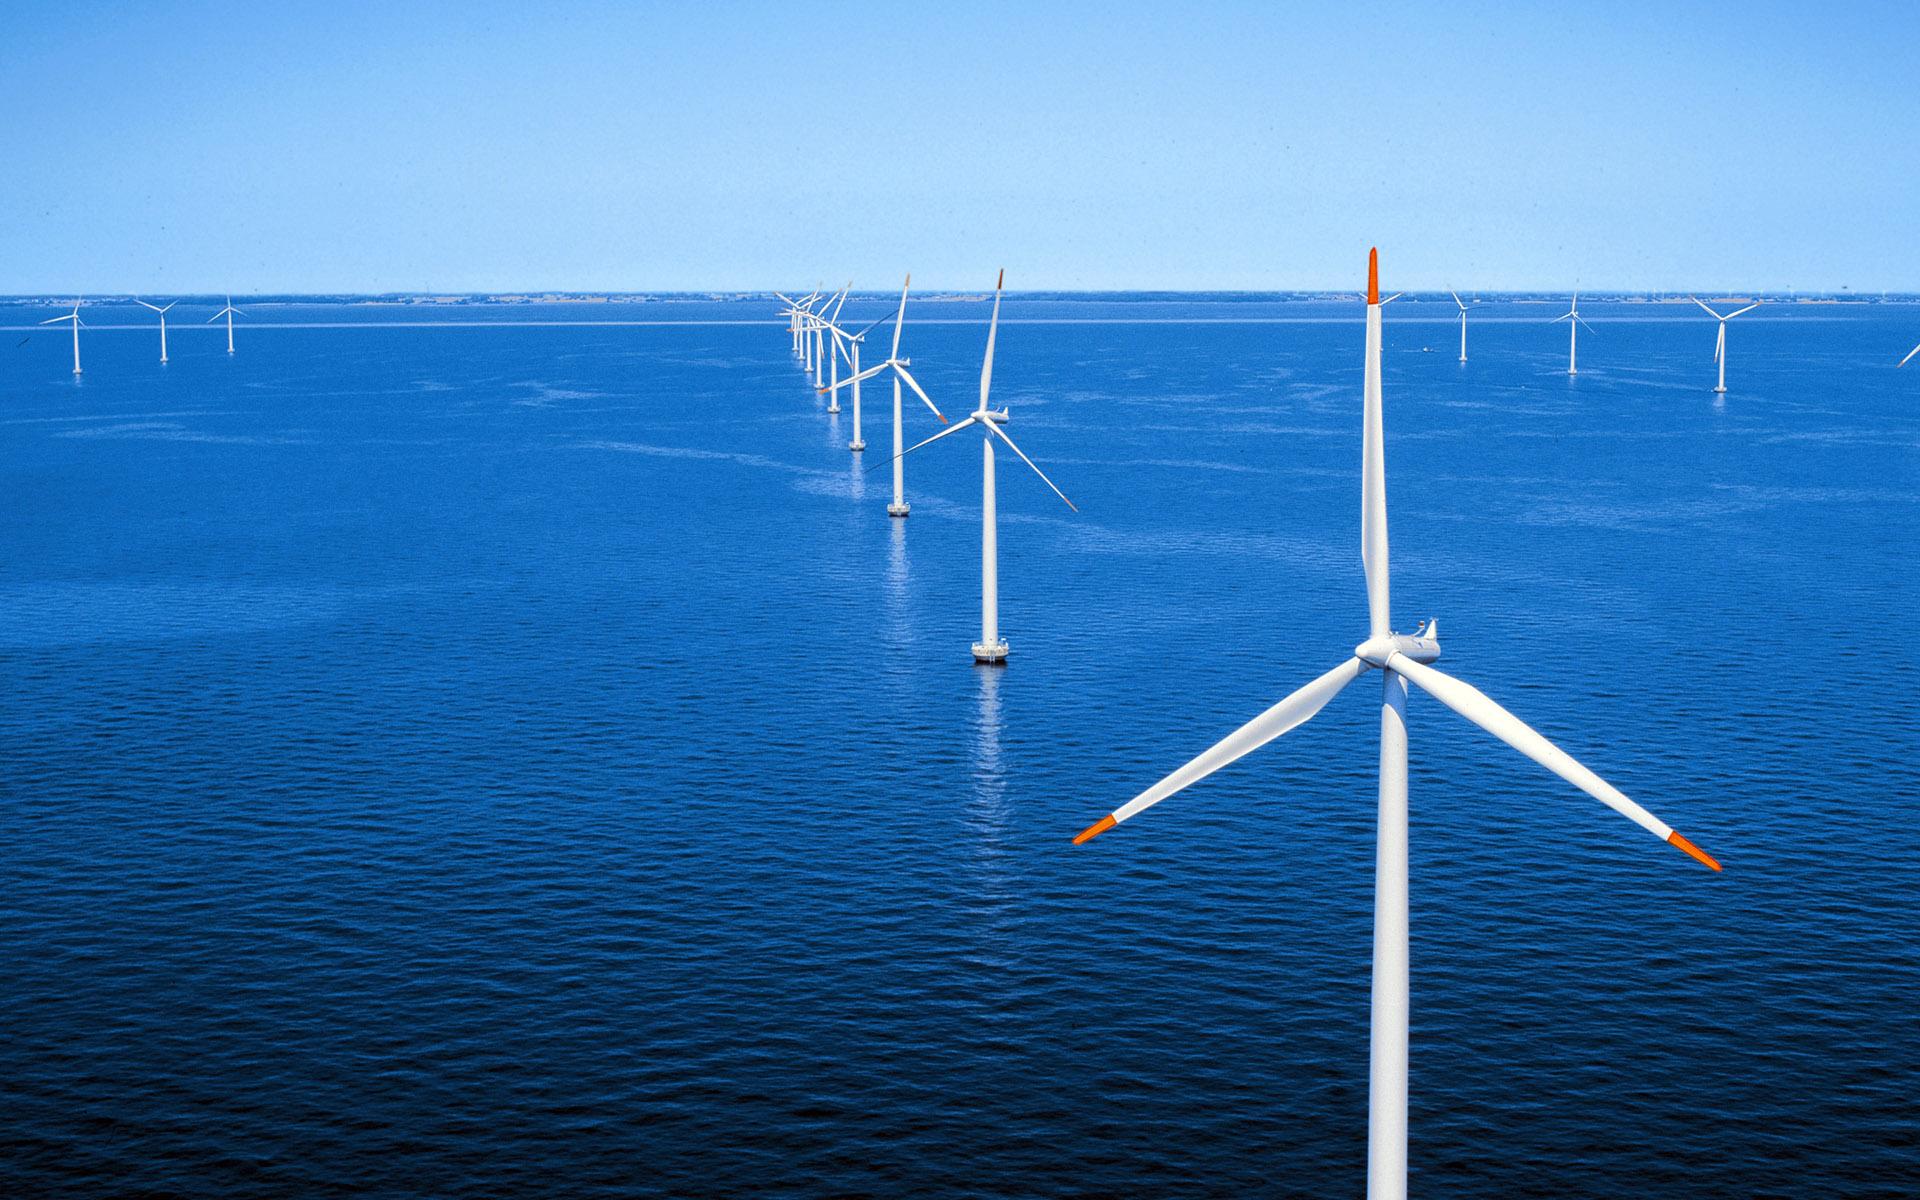 ocean windmills wallpaper 49673